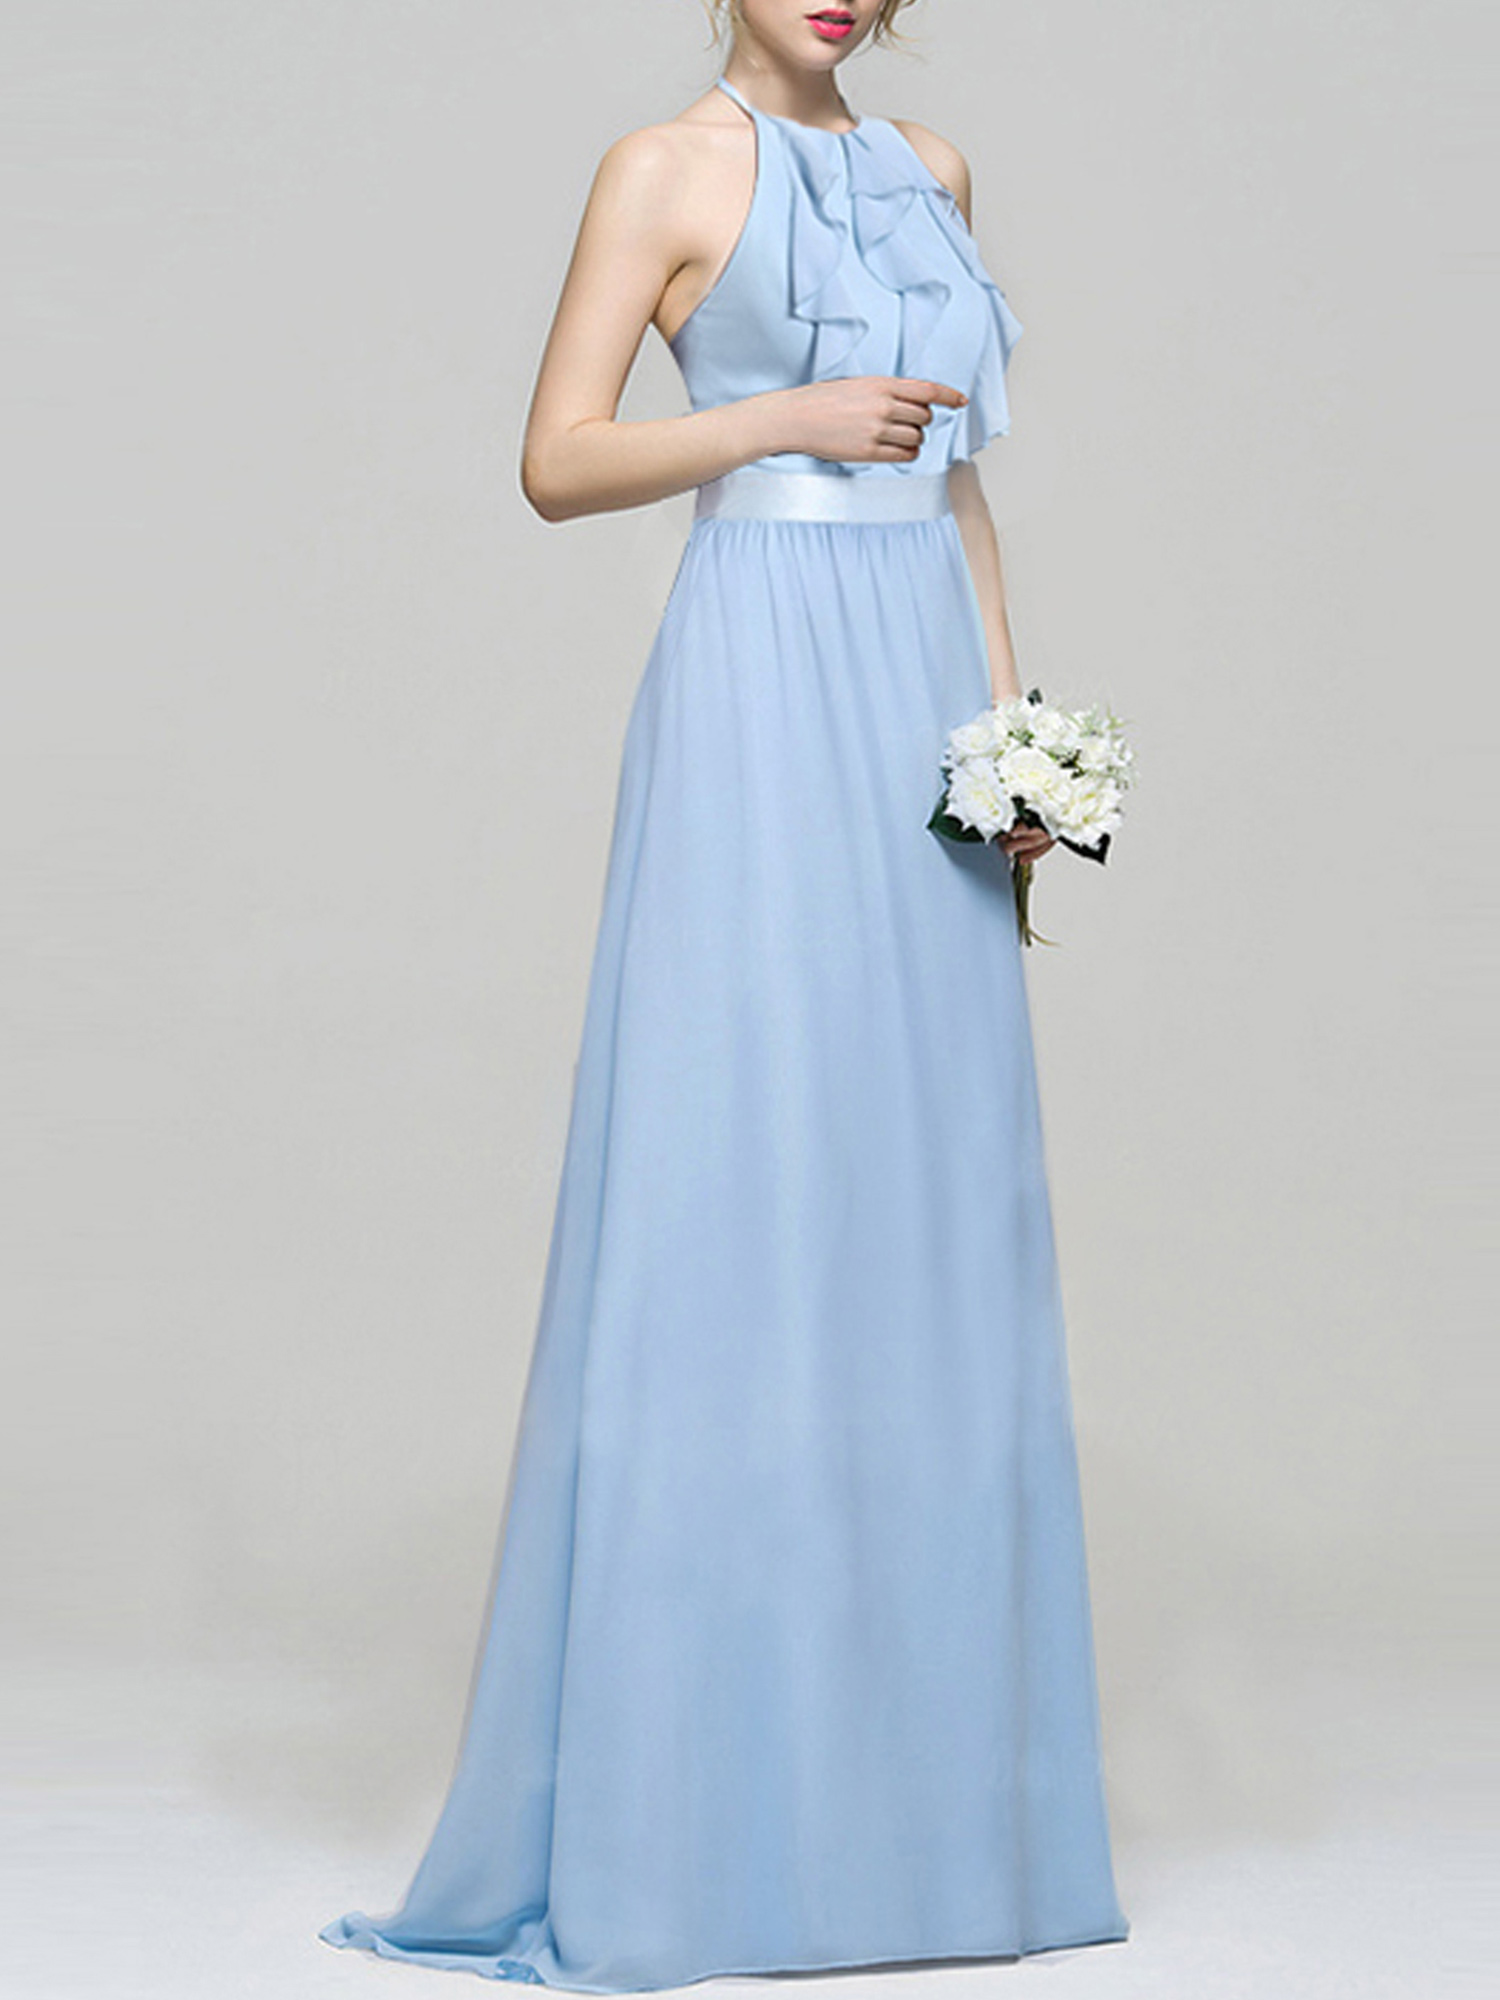 57ed05b9a9052 Ever-pretty Long Chiffon Halter Bridesmaid Dresses Evening Cocktail ...